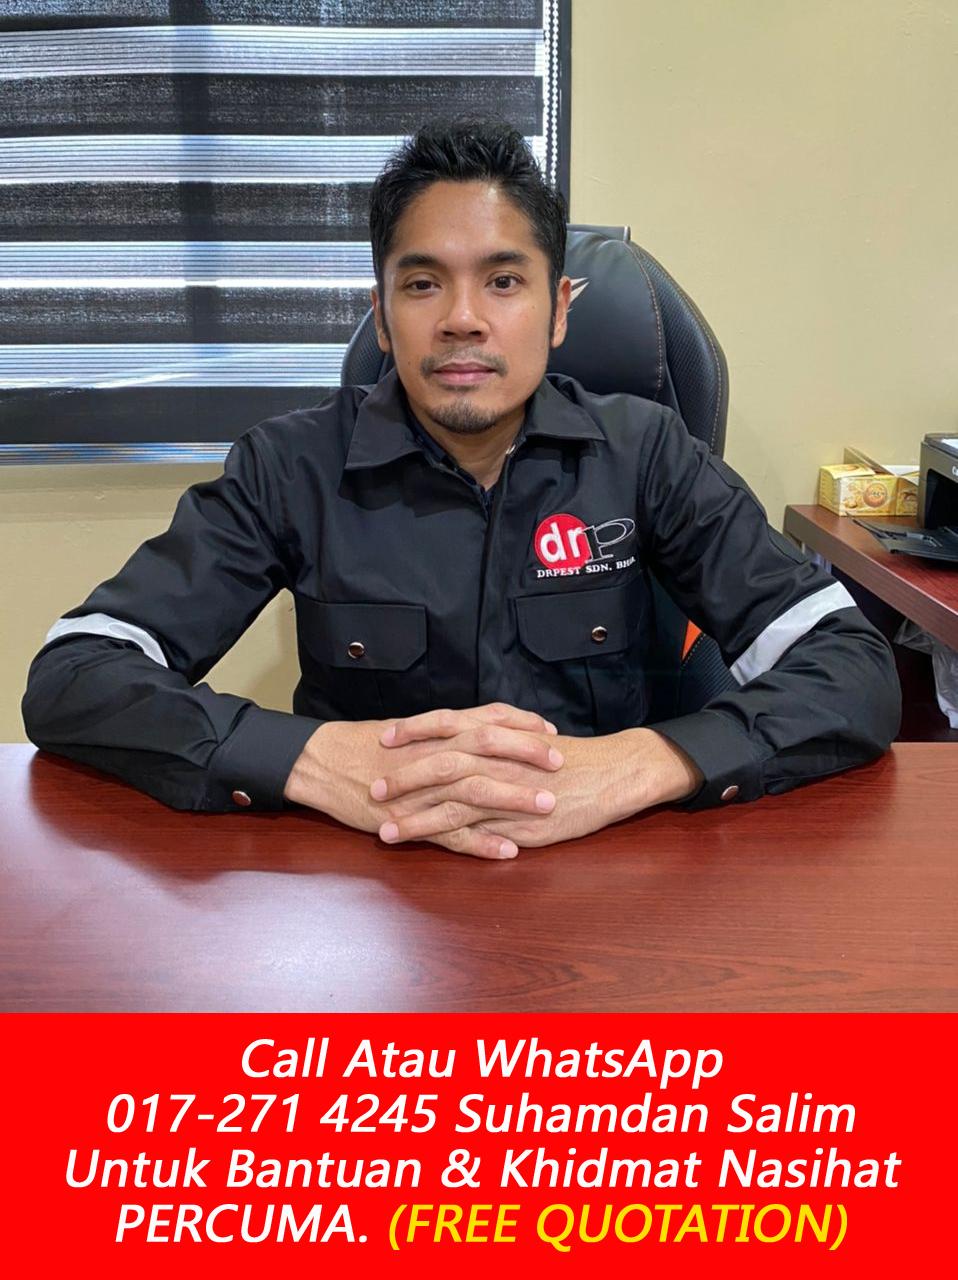 drpest sdn bhd drp maintenance and services syarikat kawalan serangga bumiputra yang berlesen the best company pest control near me area Kampung Baru kl near me